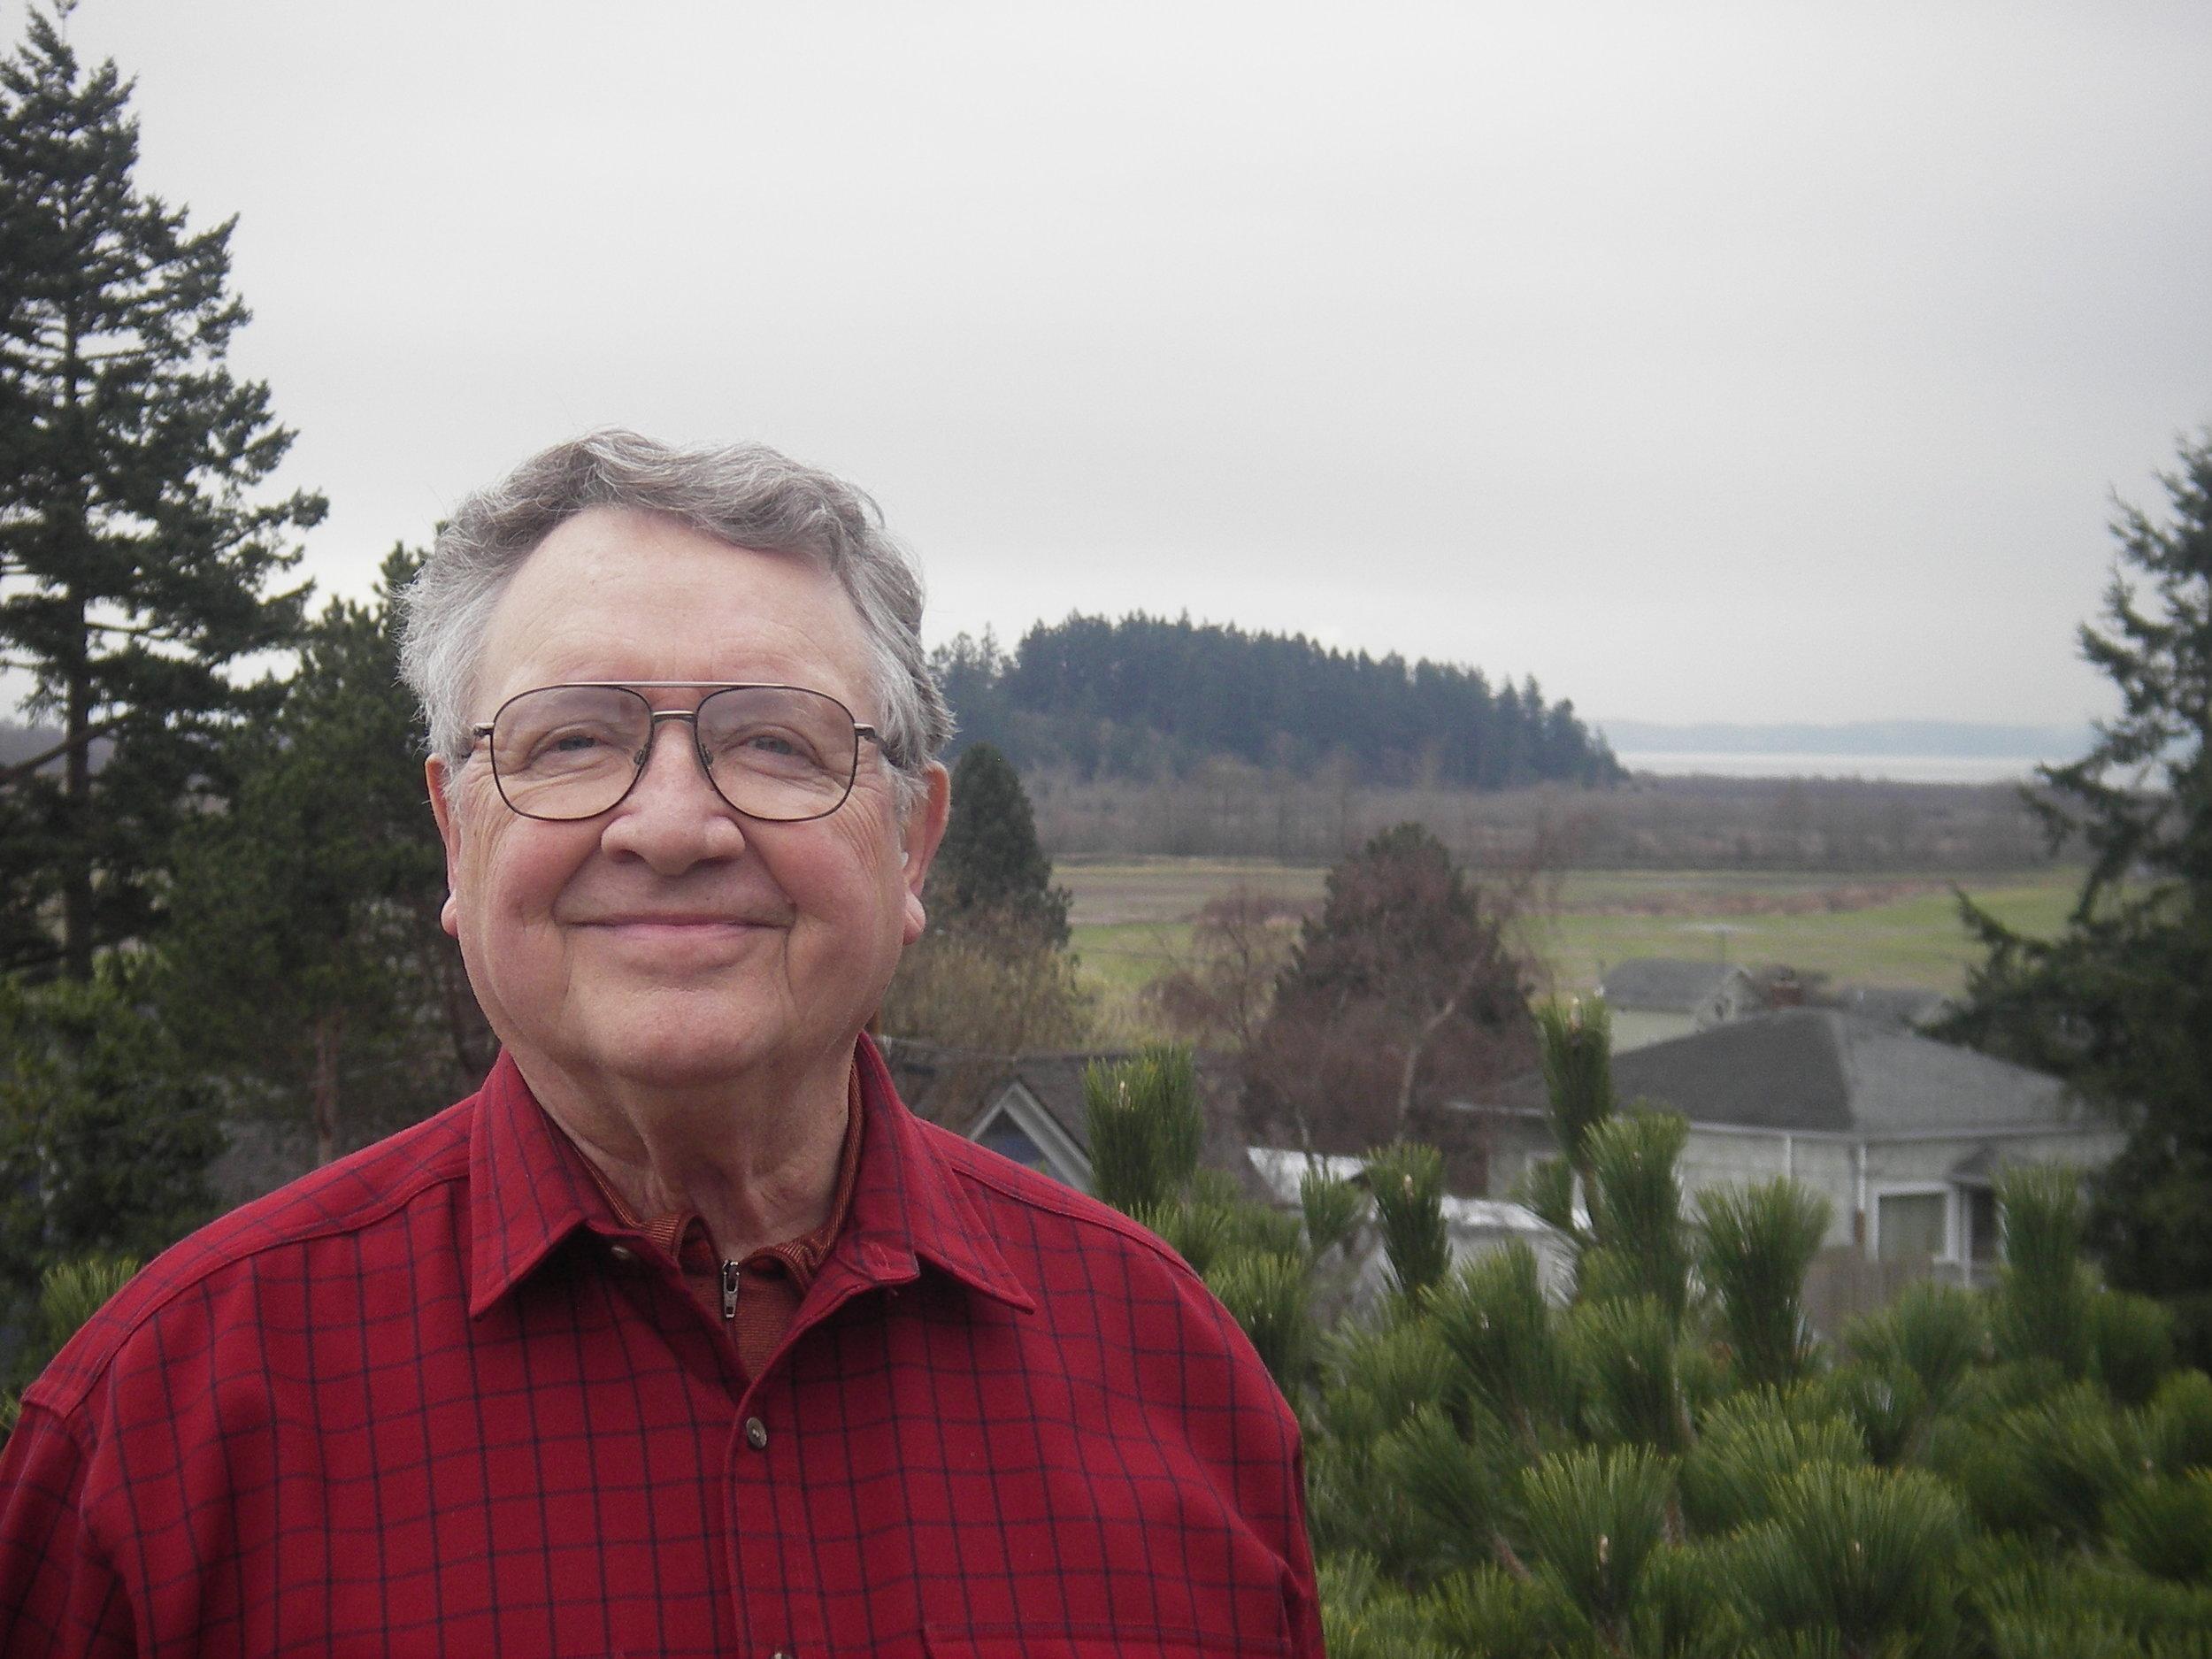 Brian Scheuch, courtesy of his family.